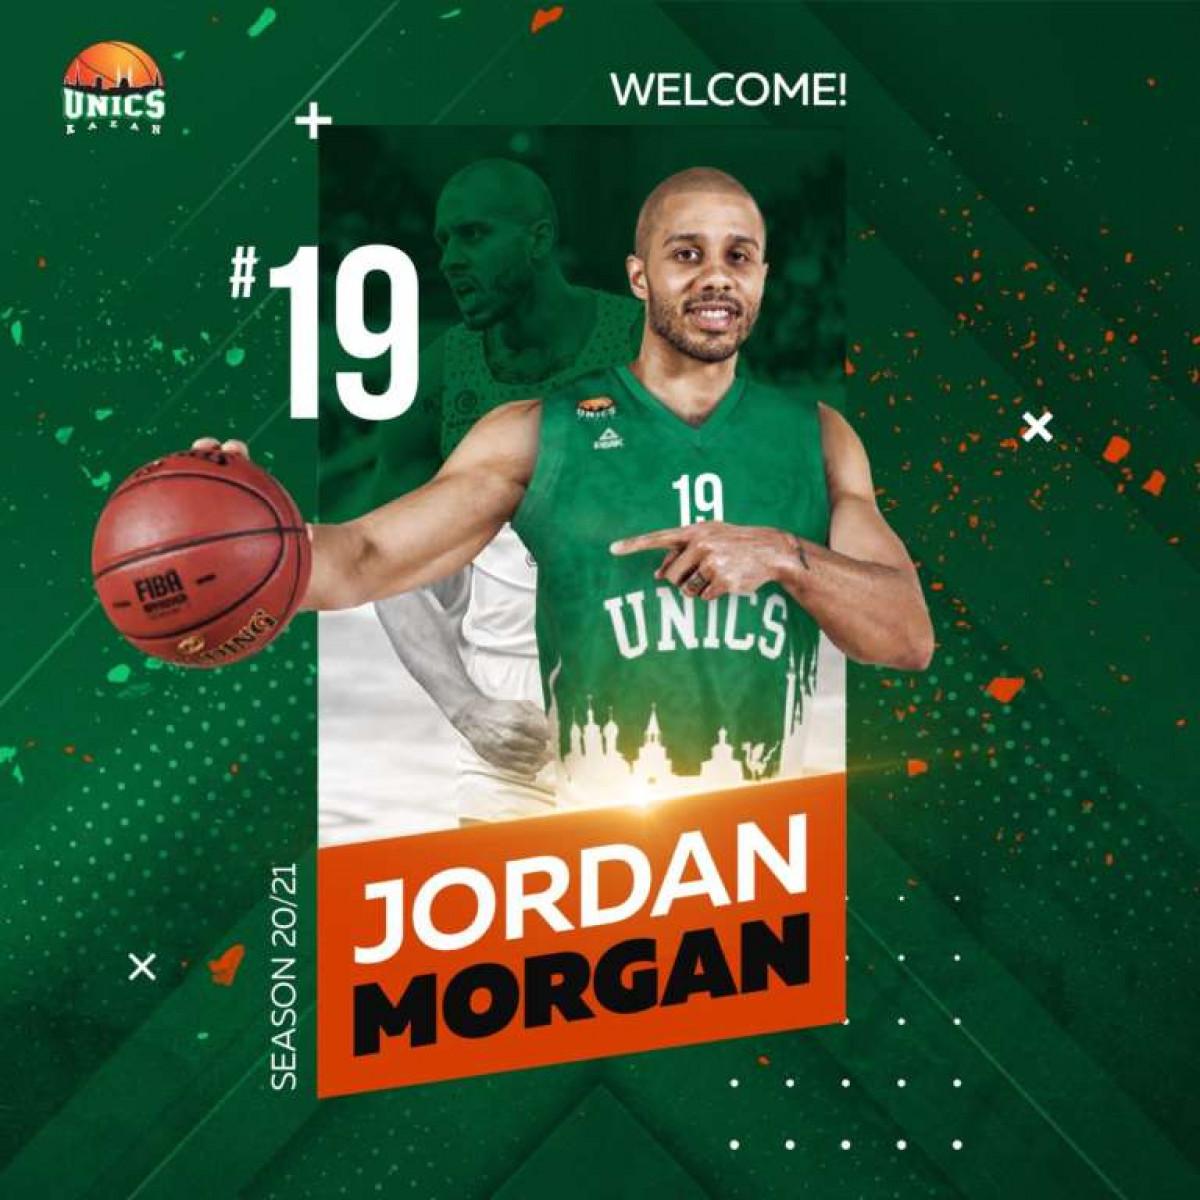 Jordan Morgan umjesto u Panathinaikosu završio u Unicsu